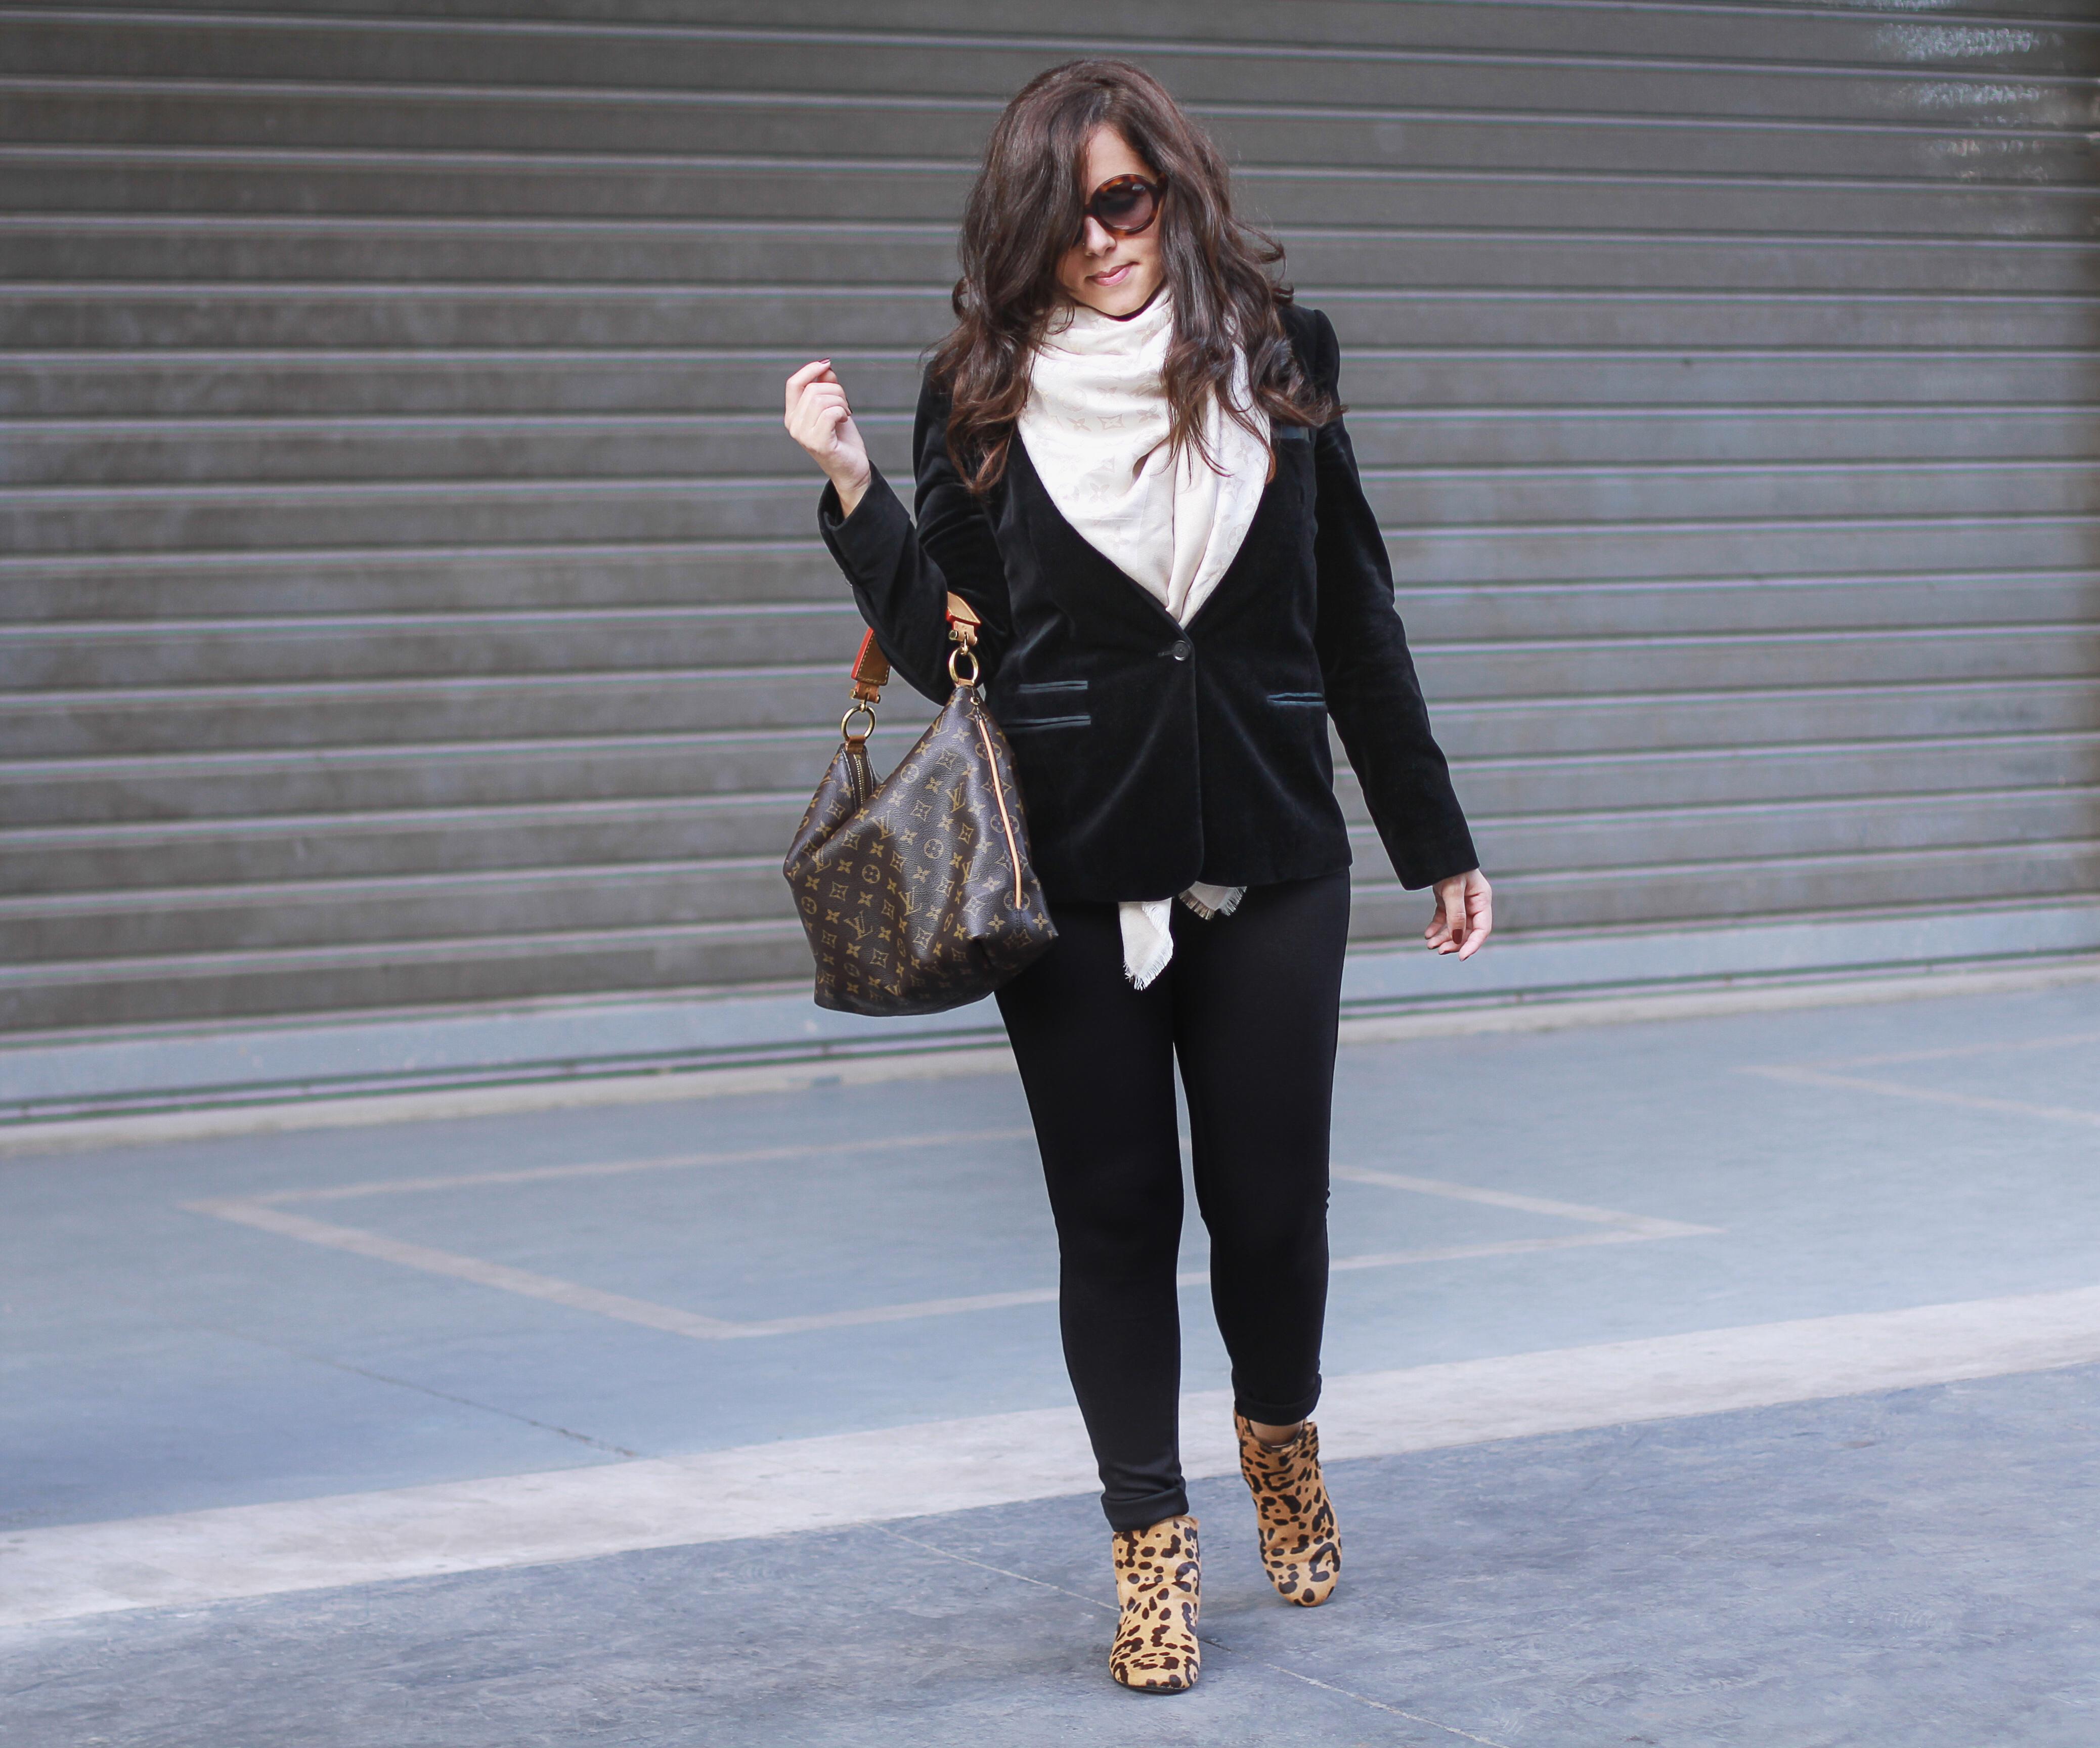 le-total-look-noir-blog-mode-chiccarpediem-2